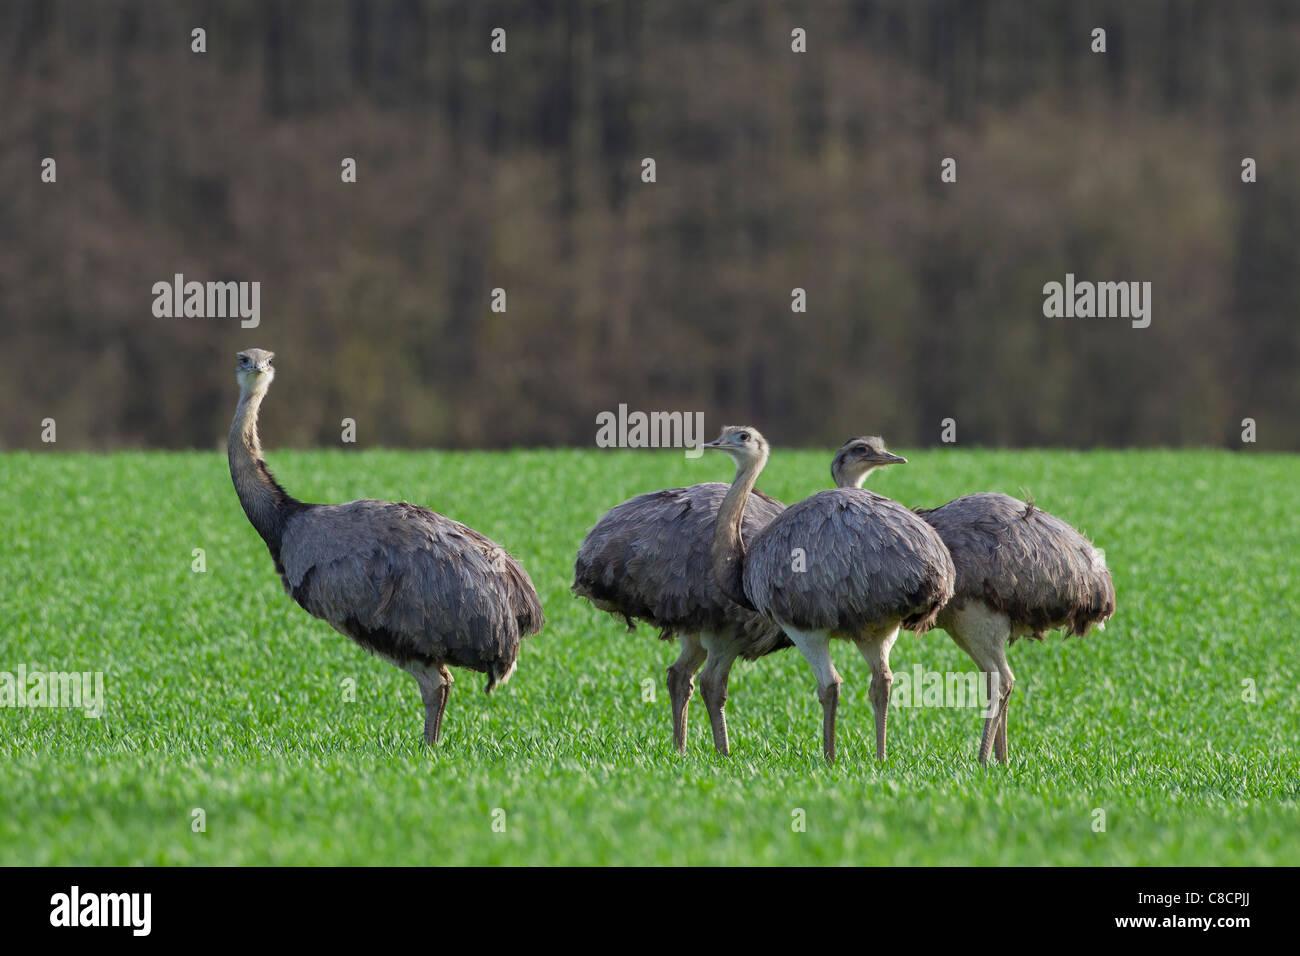 Greater Rhea (Rhea americana) flock in field. Flightless birds native to South America Stock Photo